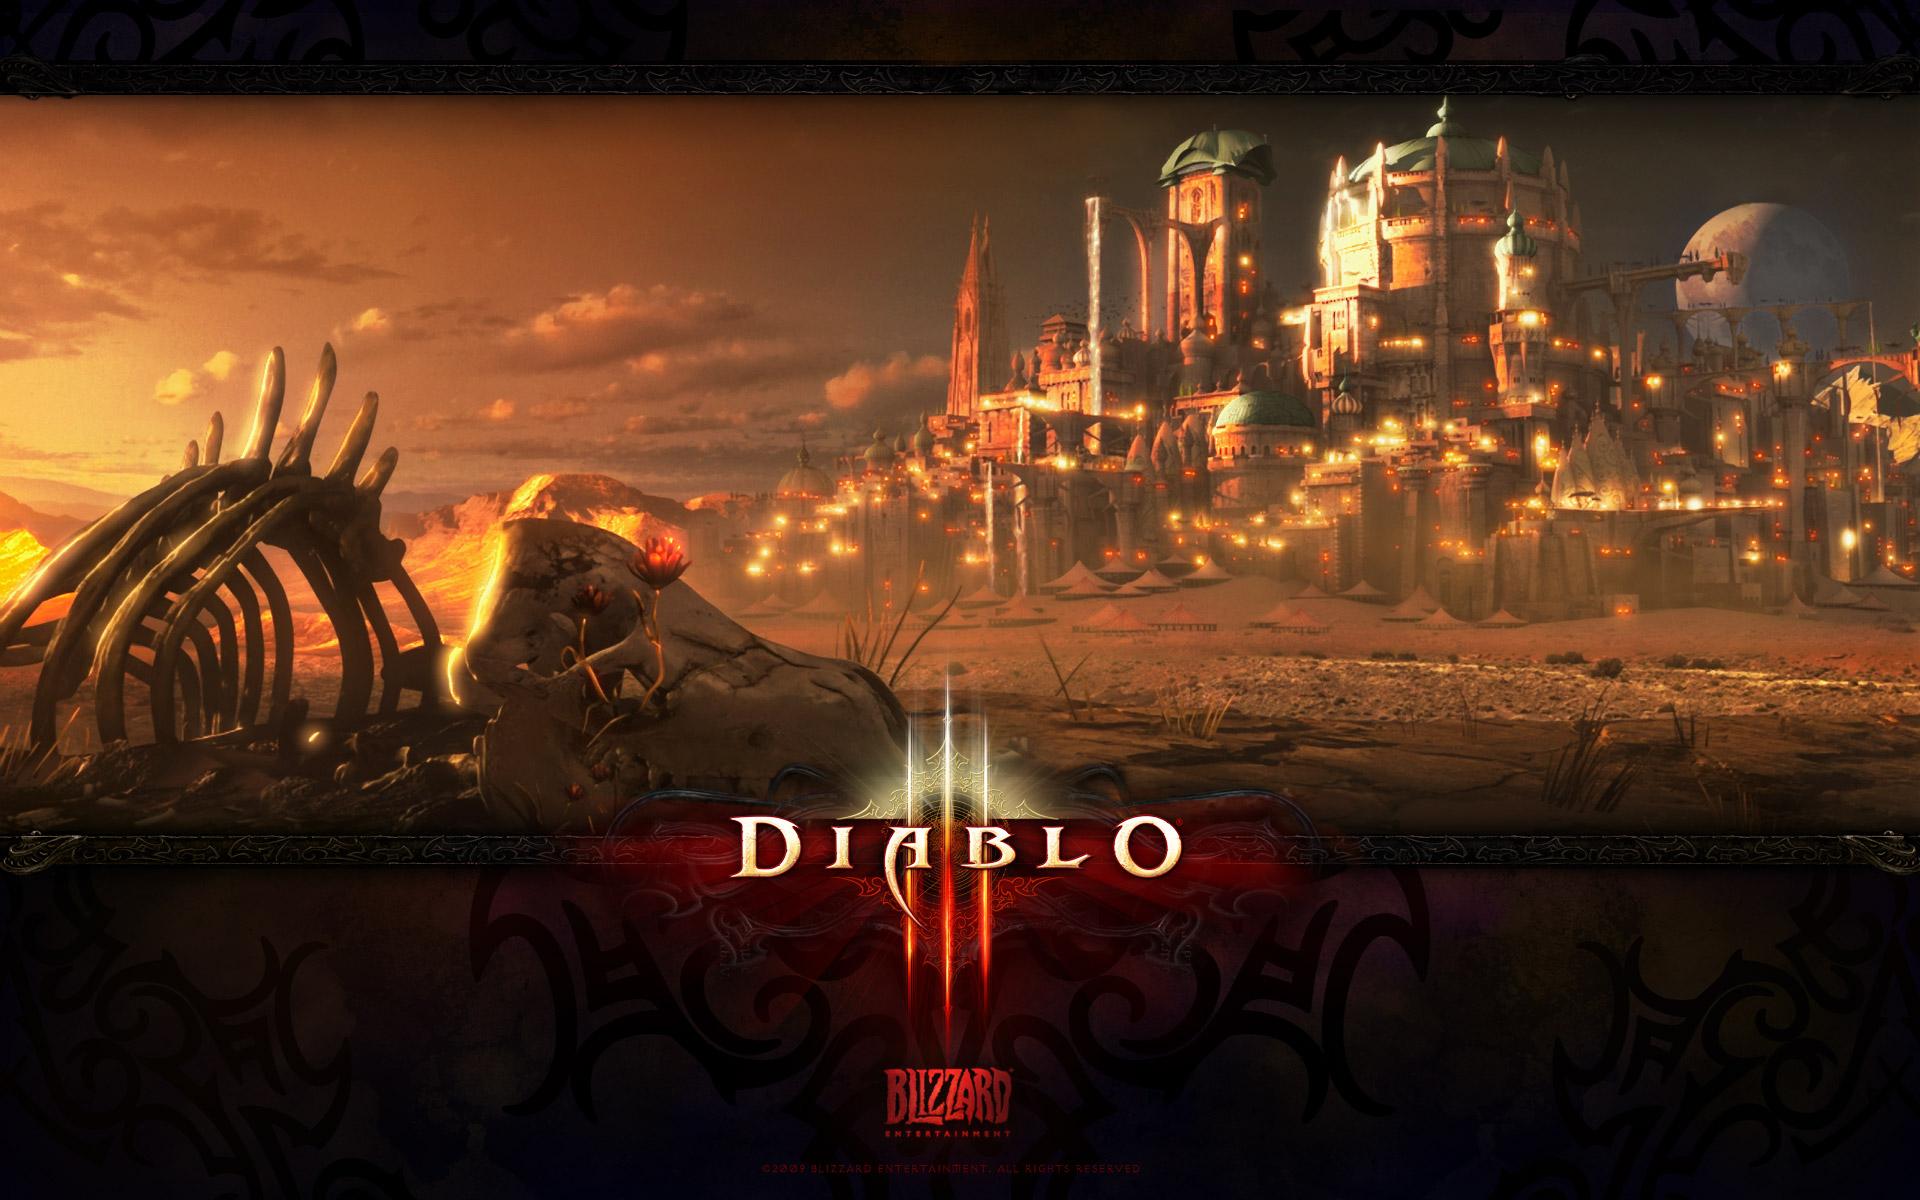 47+] Diablo 3 HD Wallpapers Widescreen on WallpaperSafari